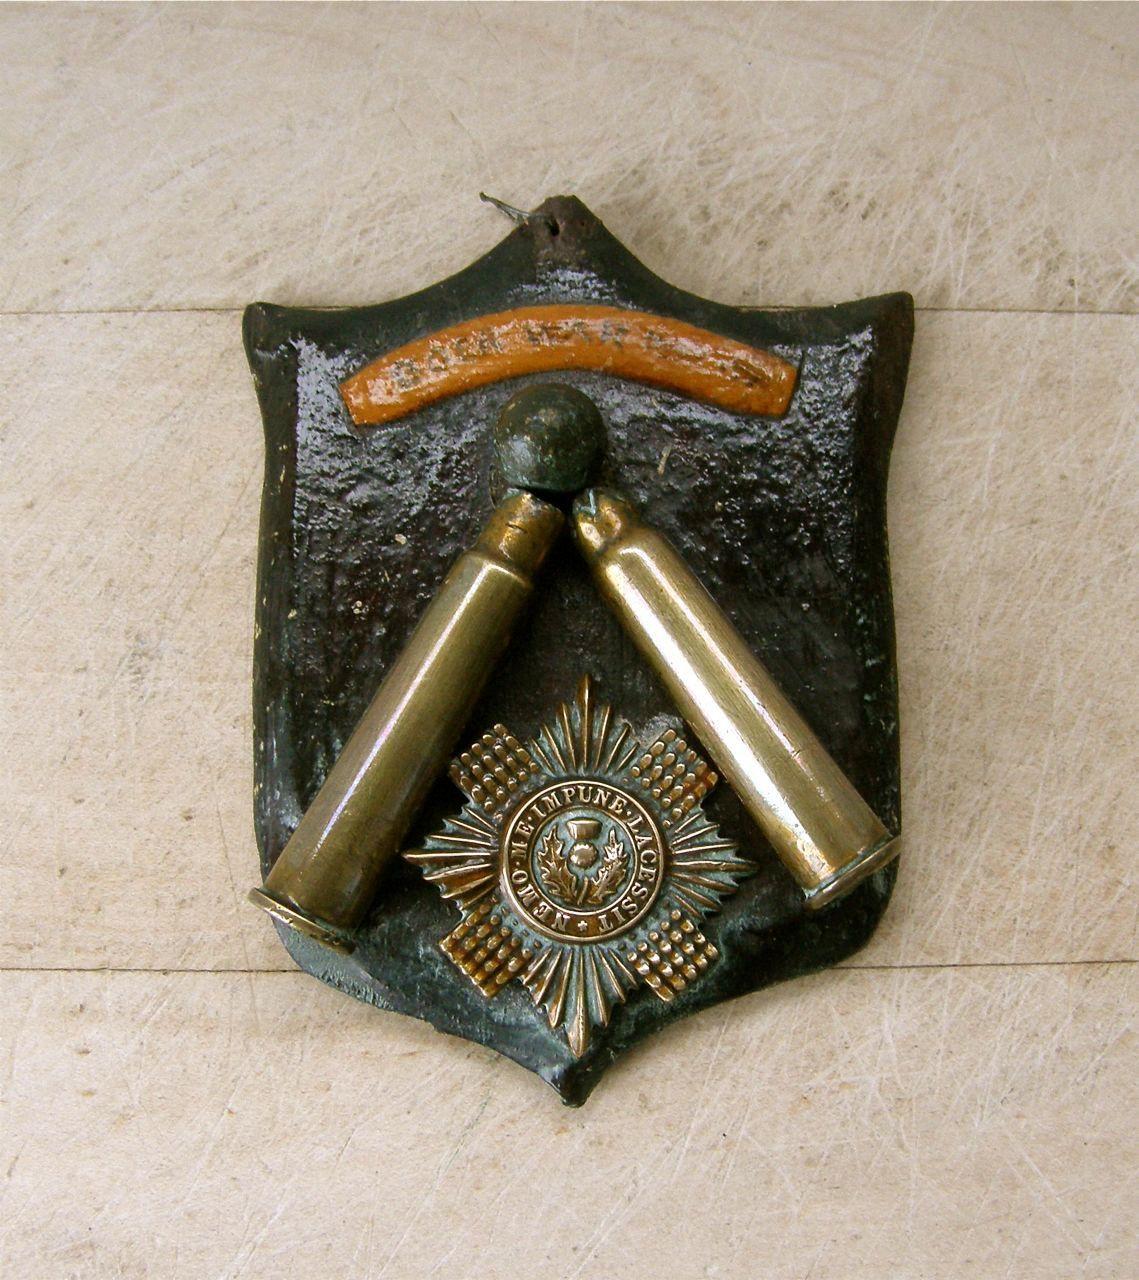 British Boer War Plaque 2 Cartridge Cases Bullet Scots Guards Badge Ooak Military Collectible